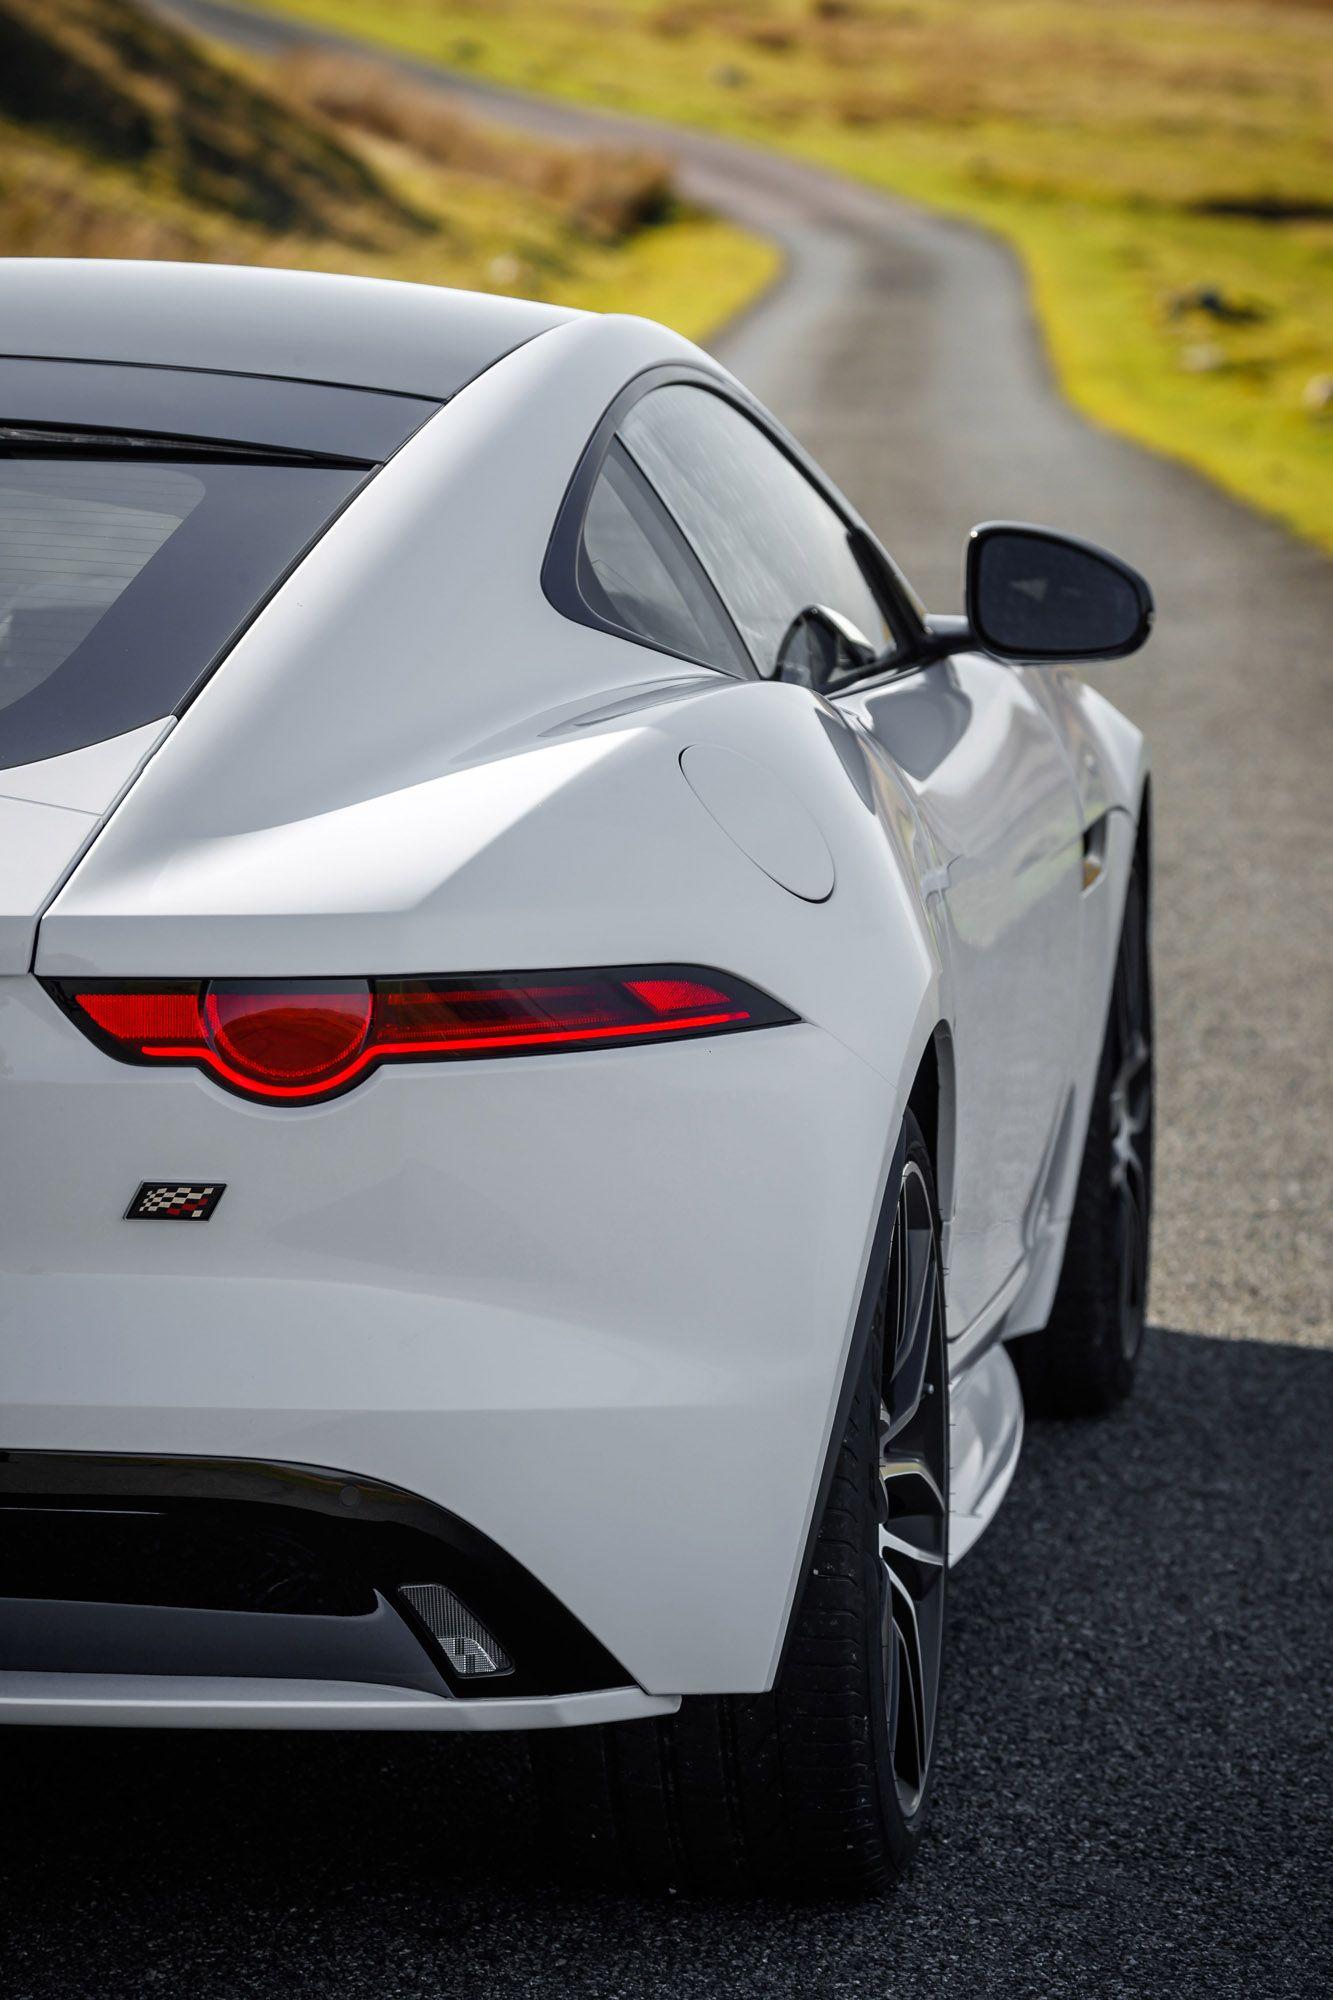 Jaguar Proudly Unveils F Type Chequered Flag Edition Model Affordable Sports Cars Jaguar F Type Jaguar Car